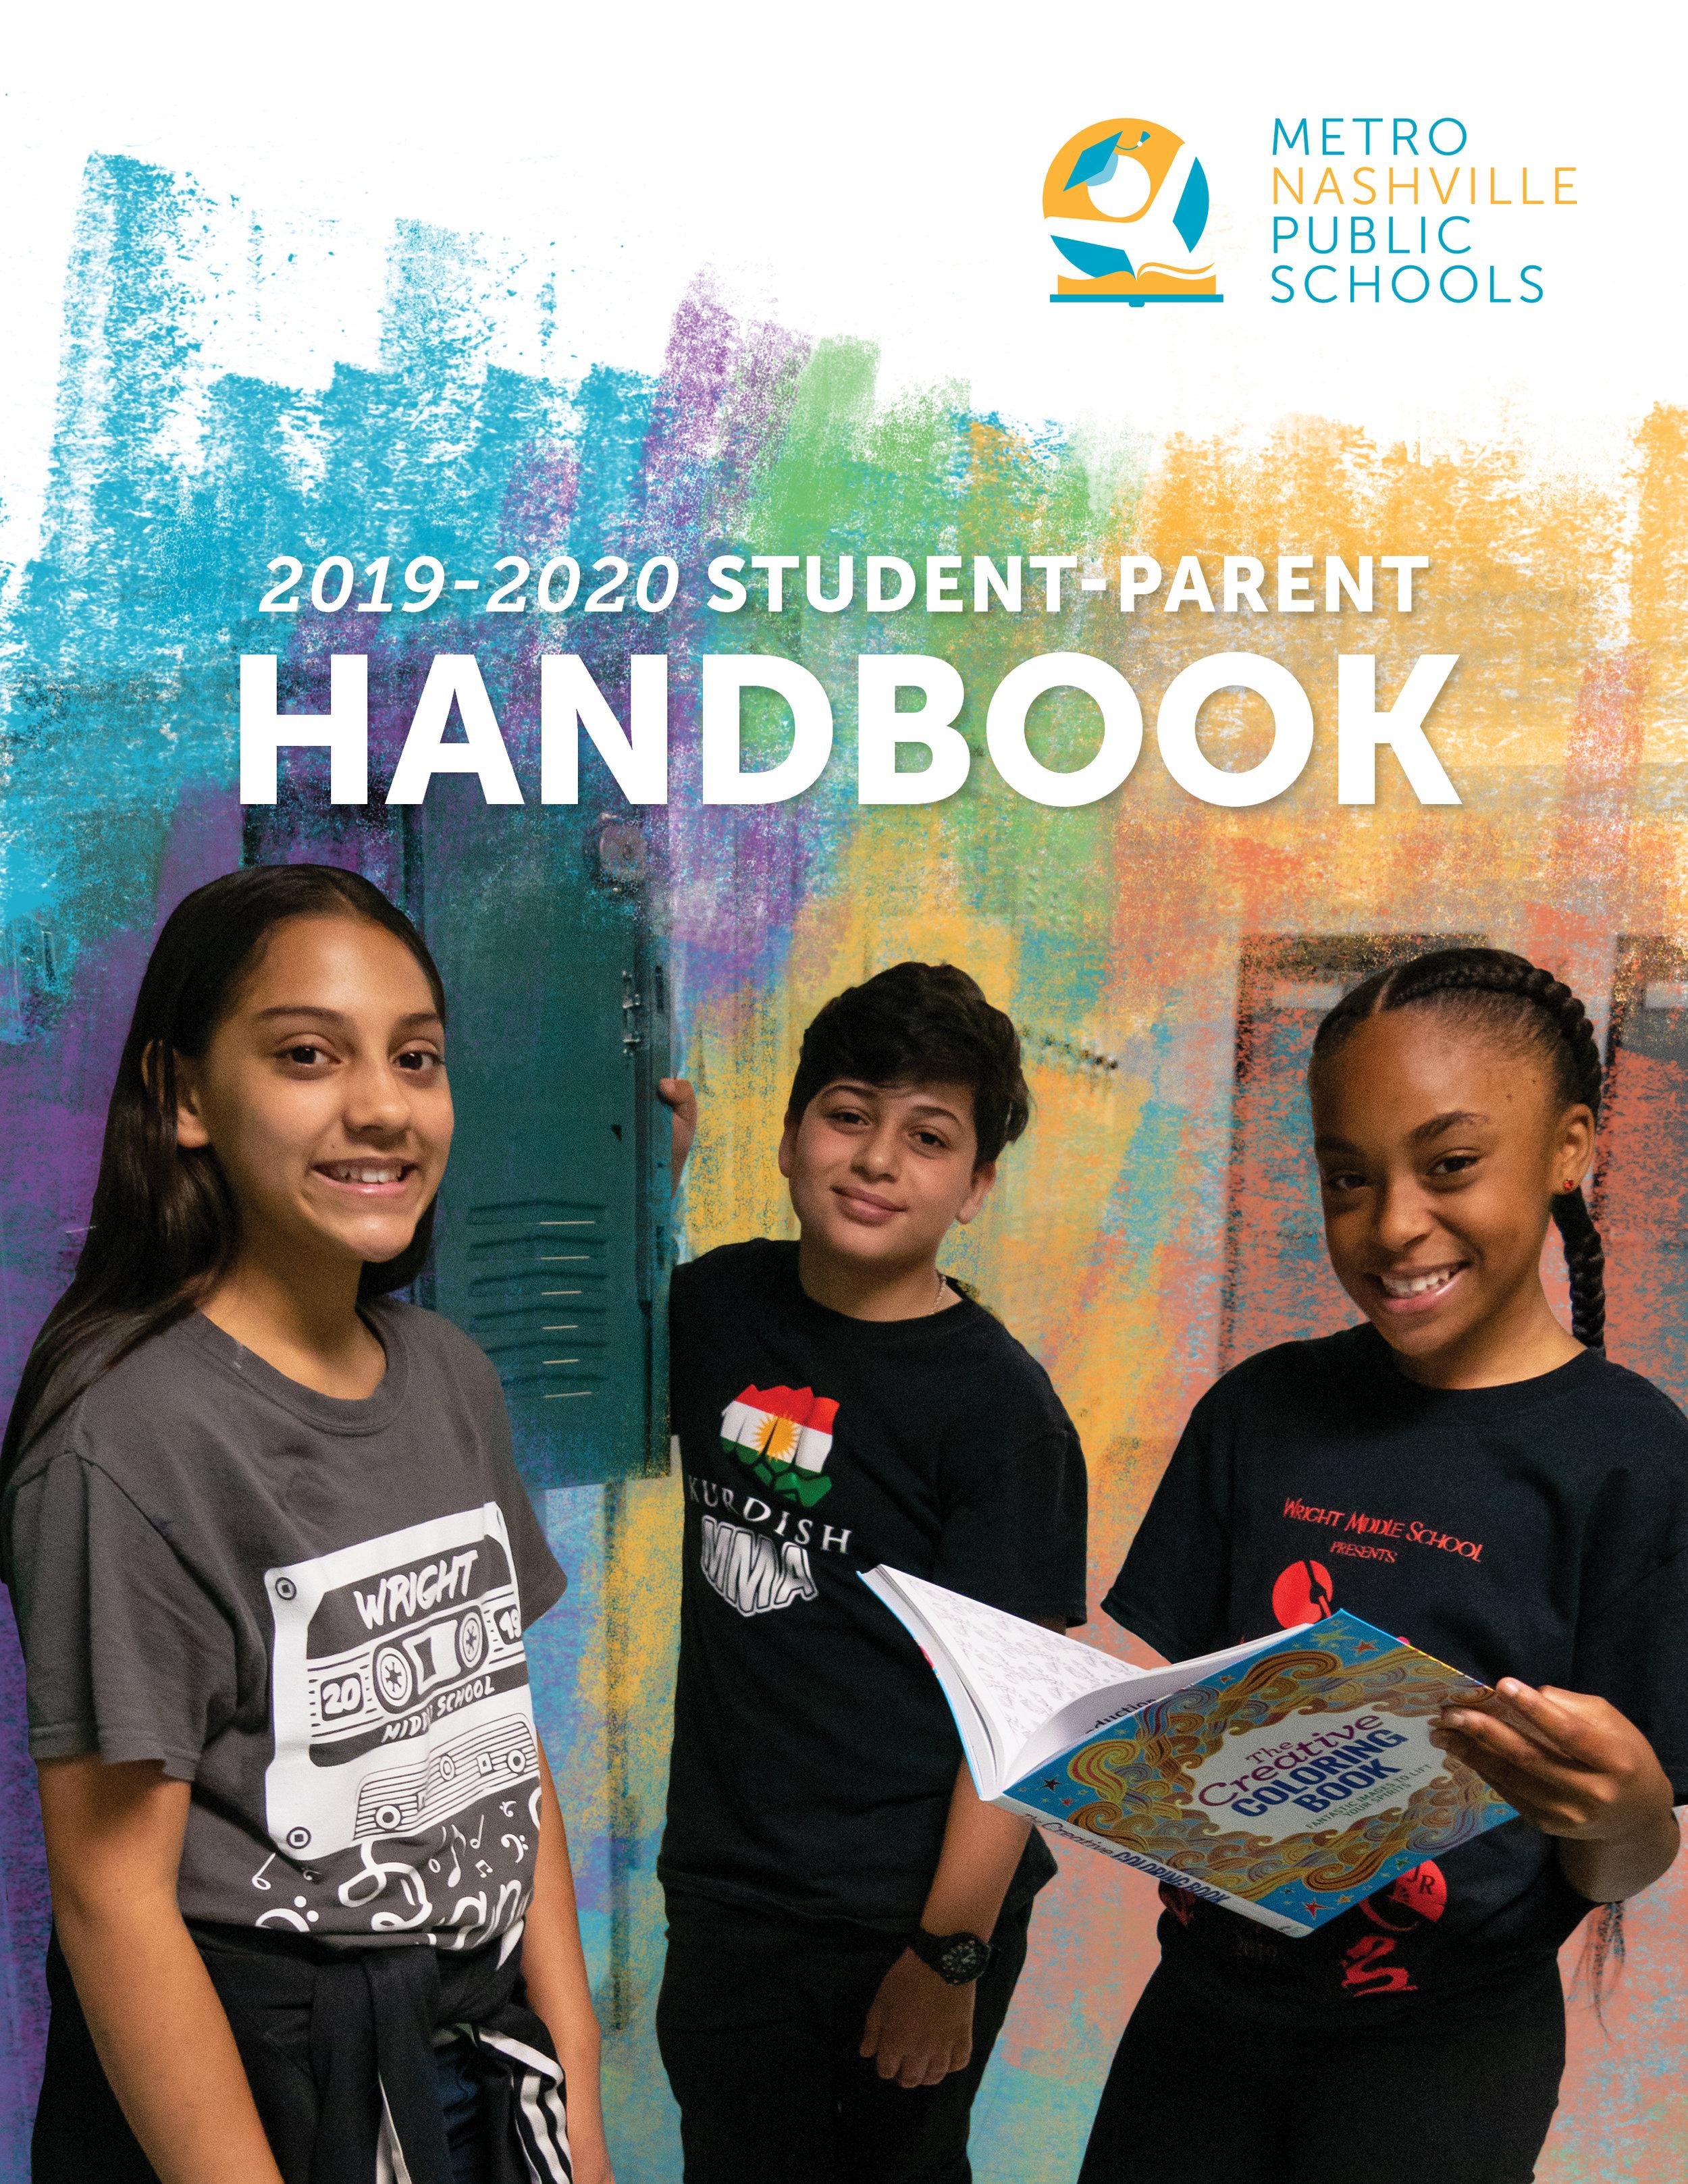 2019-20_StudentParentHandbook_Cover.jpg